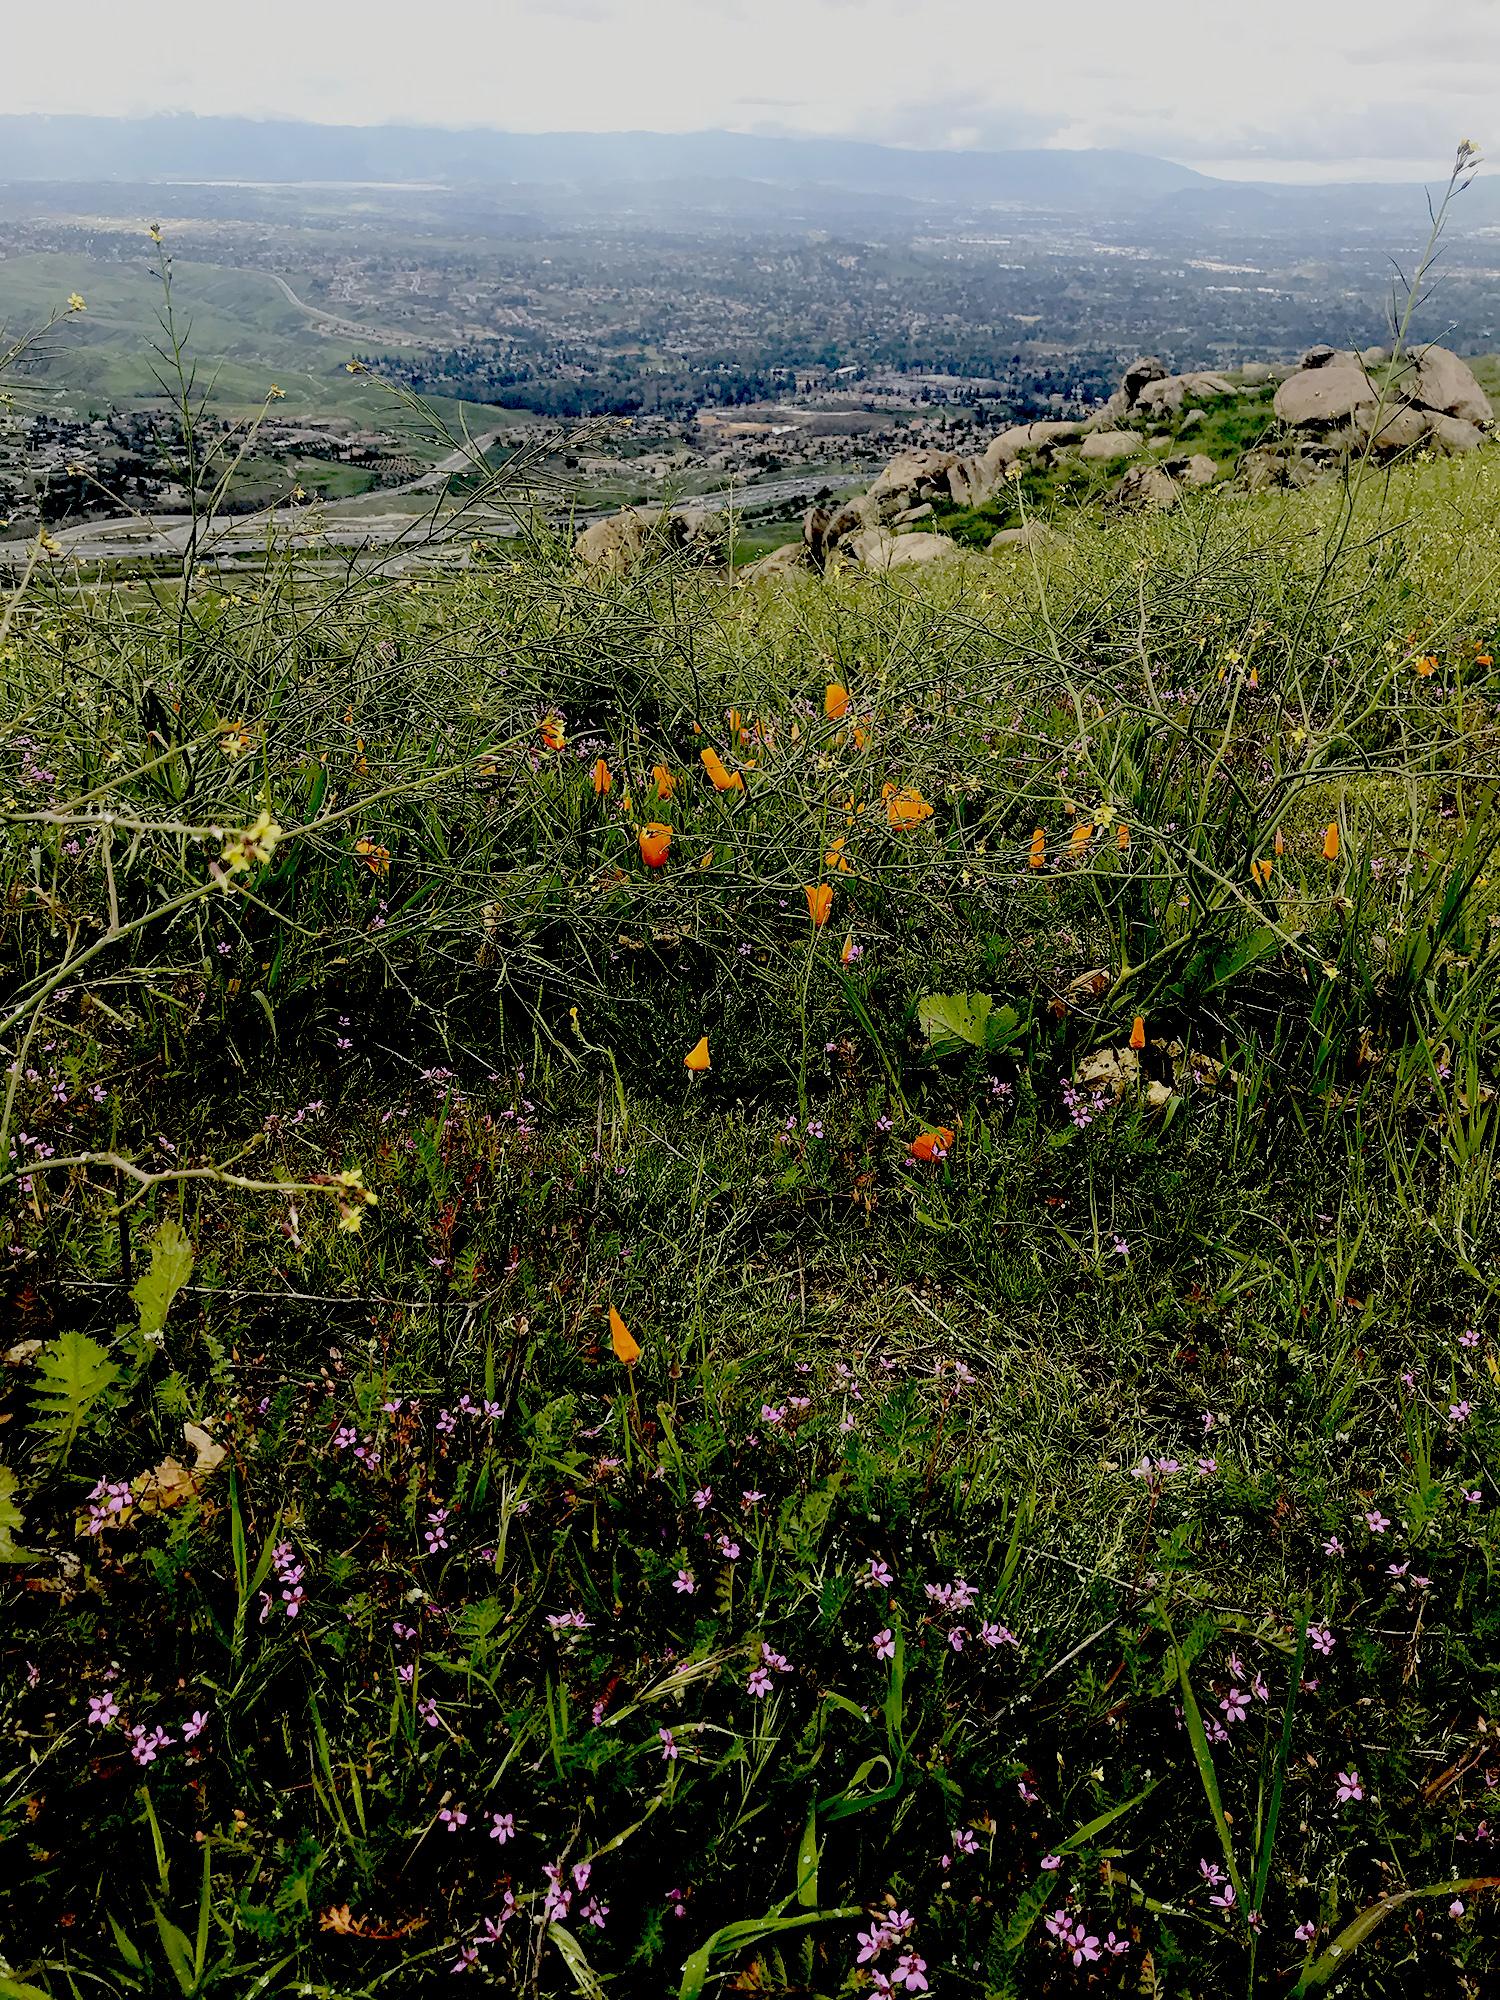 Box Springs Mountain Park Moreno Valley CA10.jpg